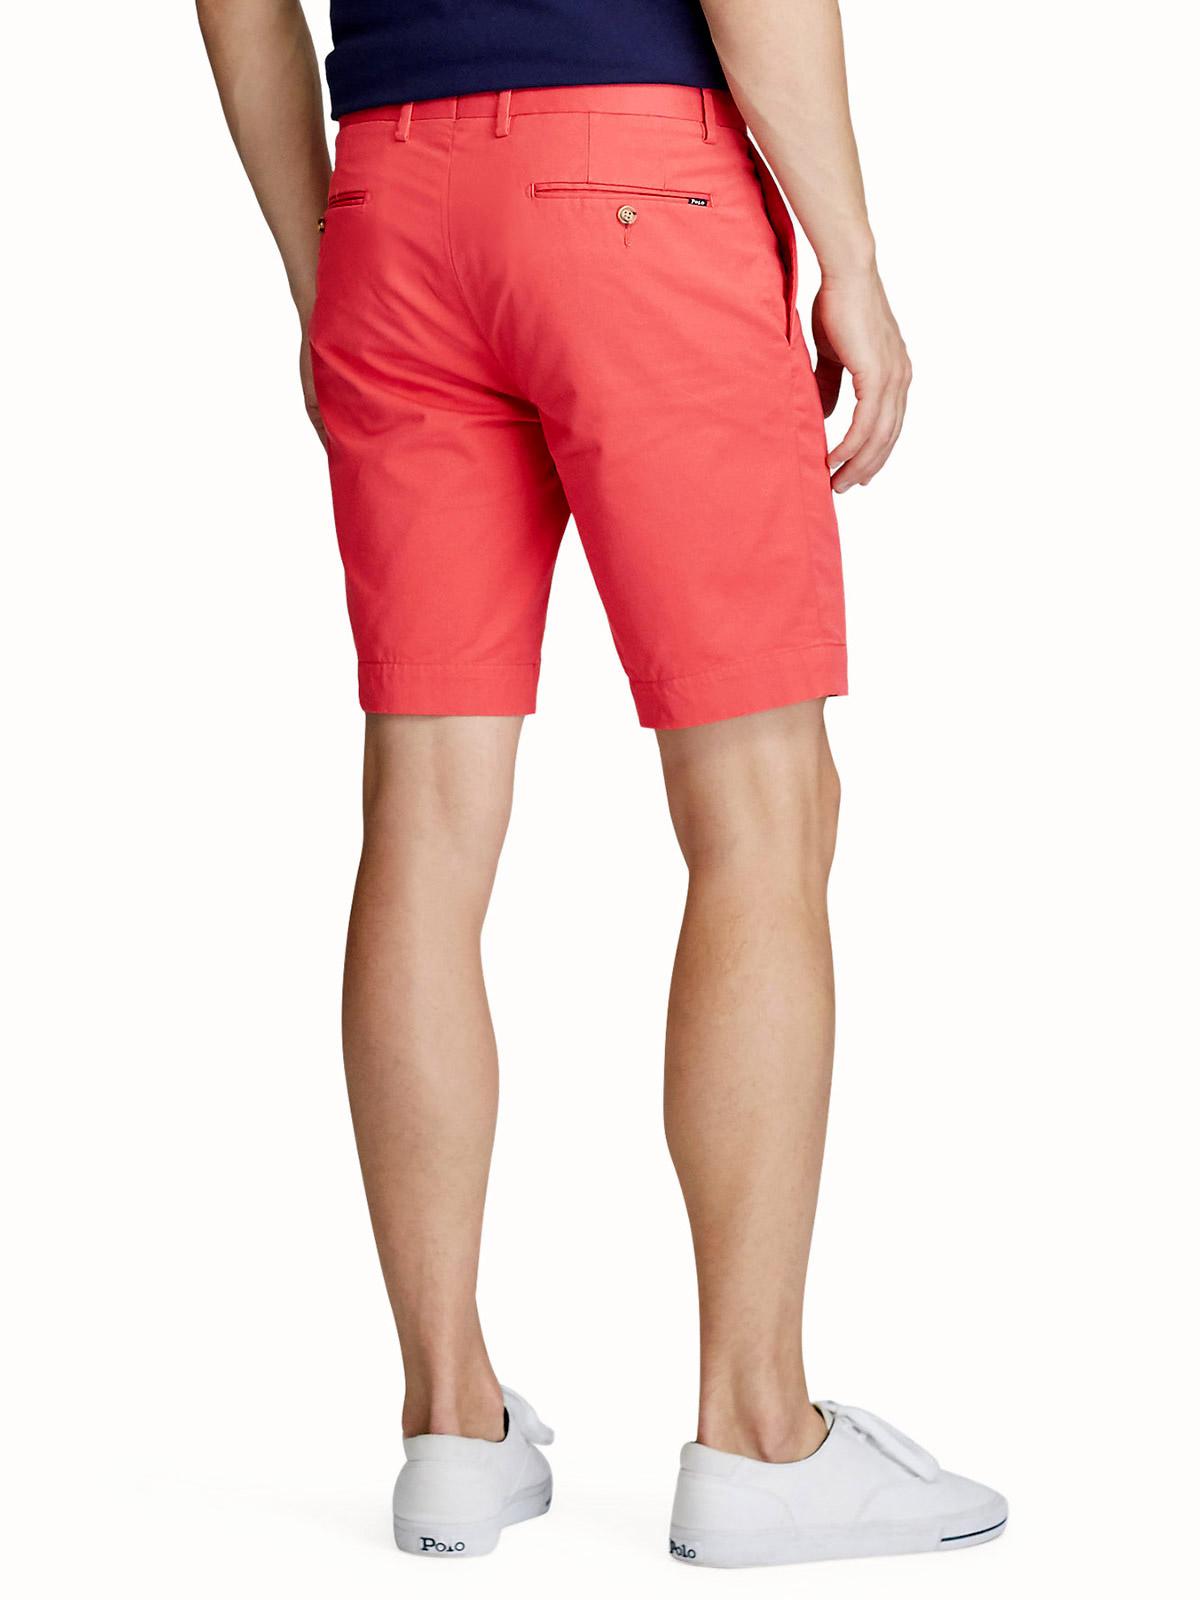 Picture of POLO RALPH LAUREN | Men's Stretch Cotton Shorts